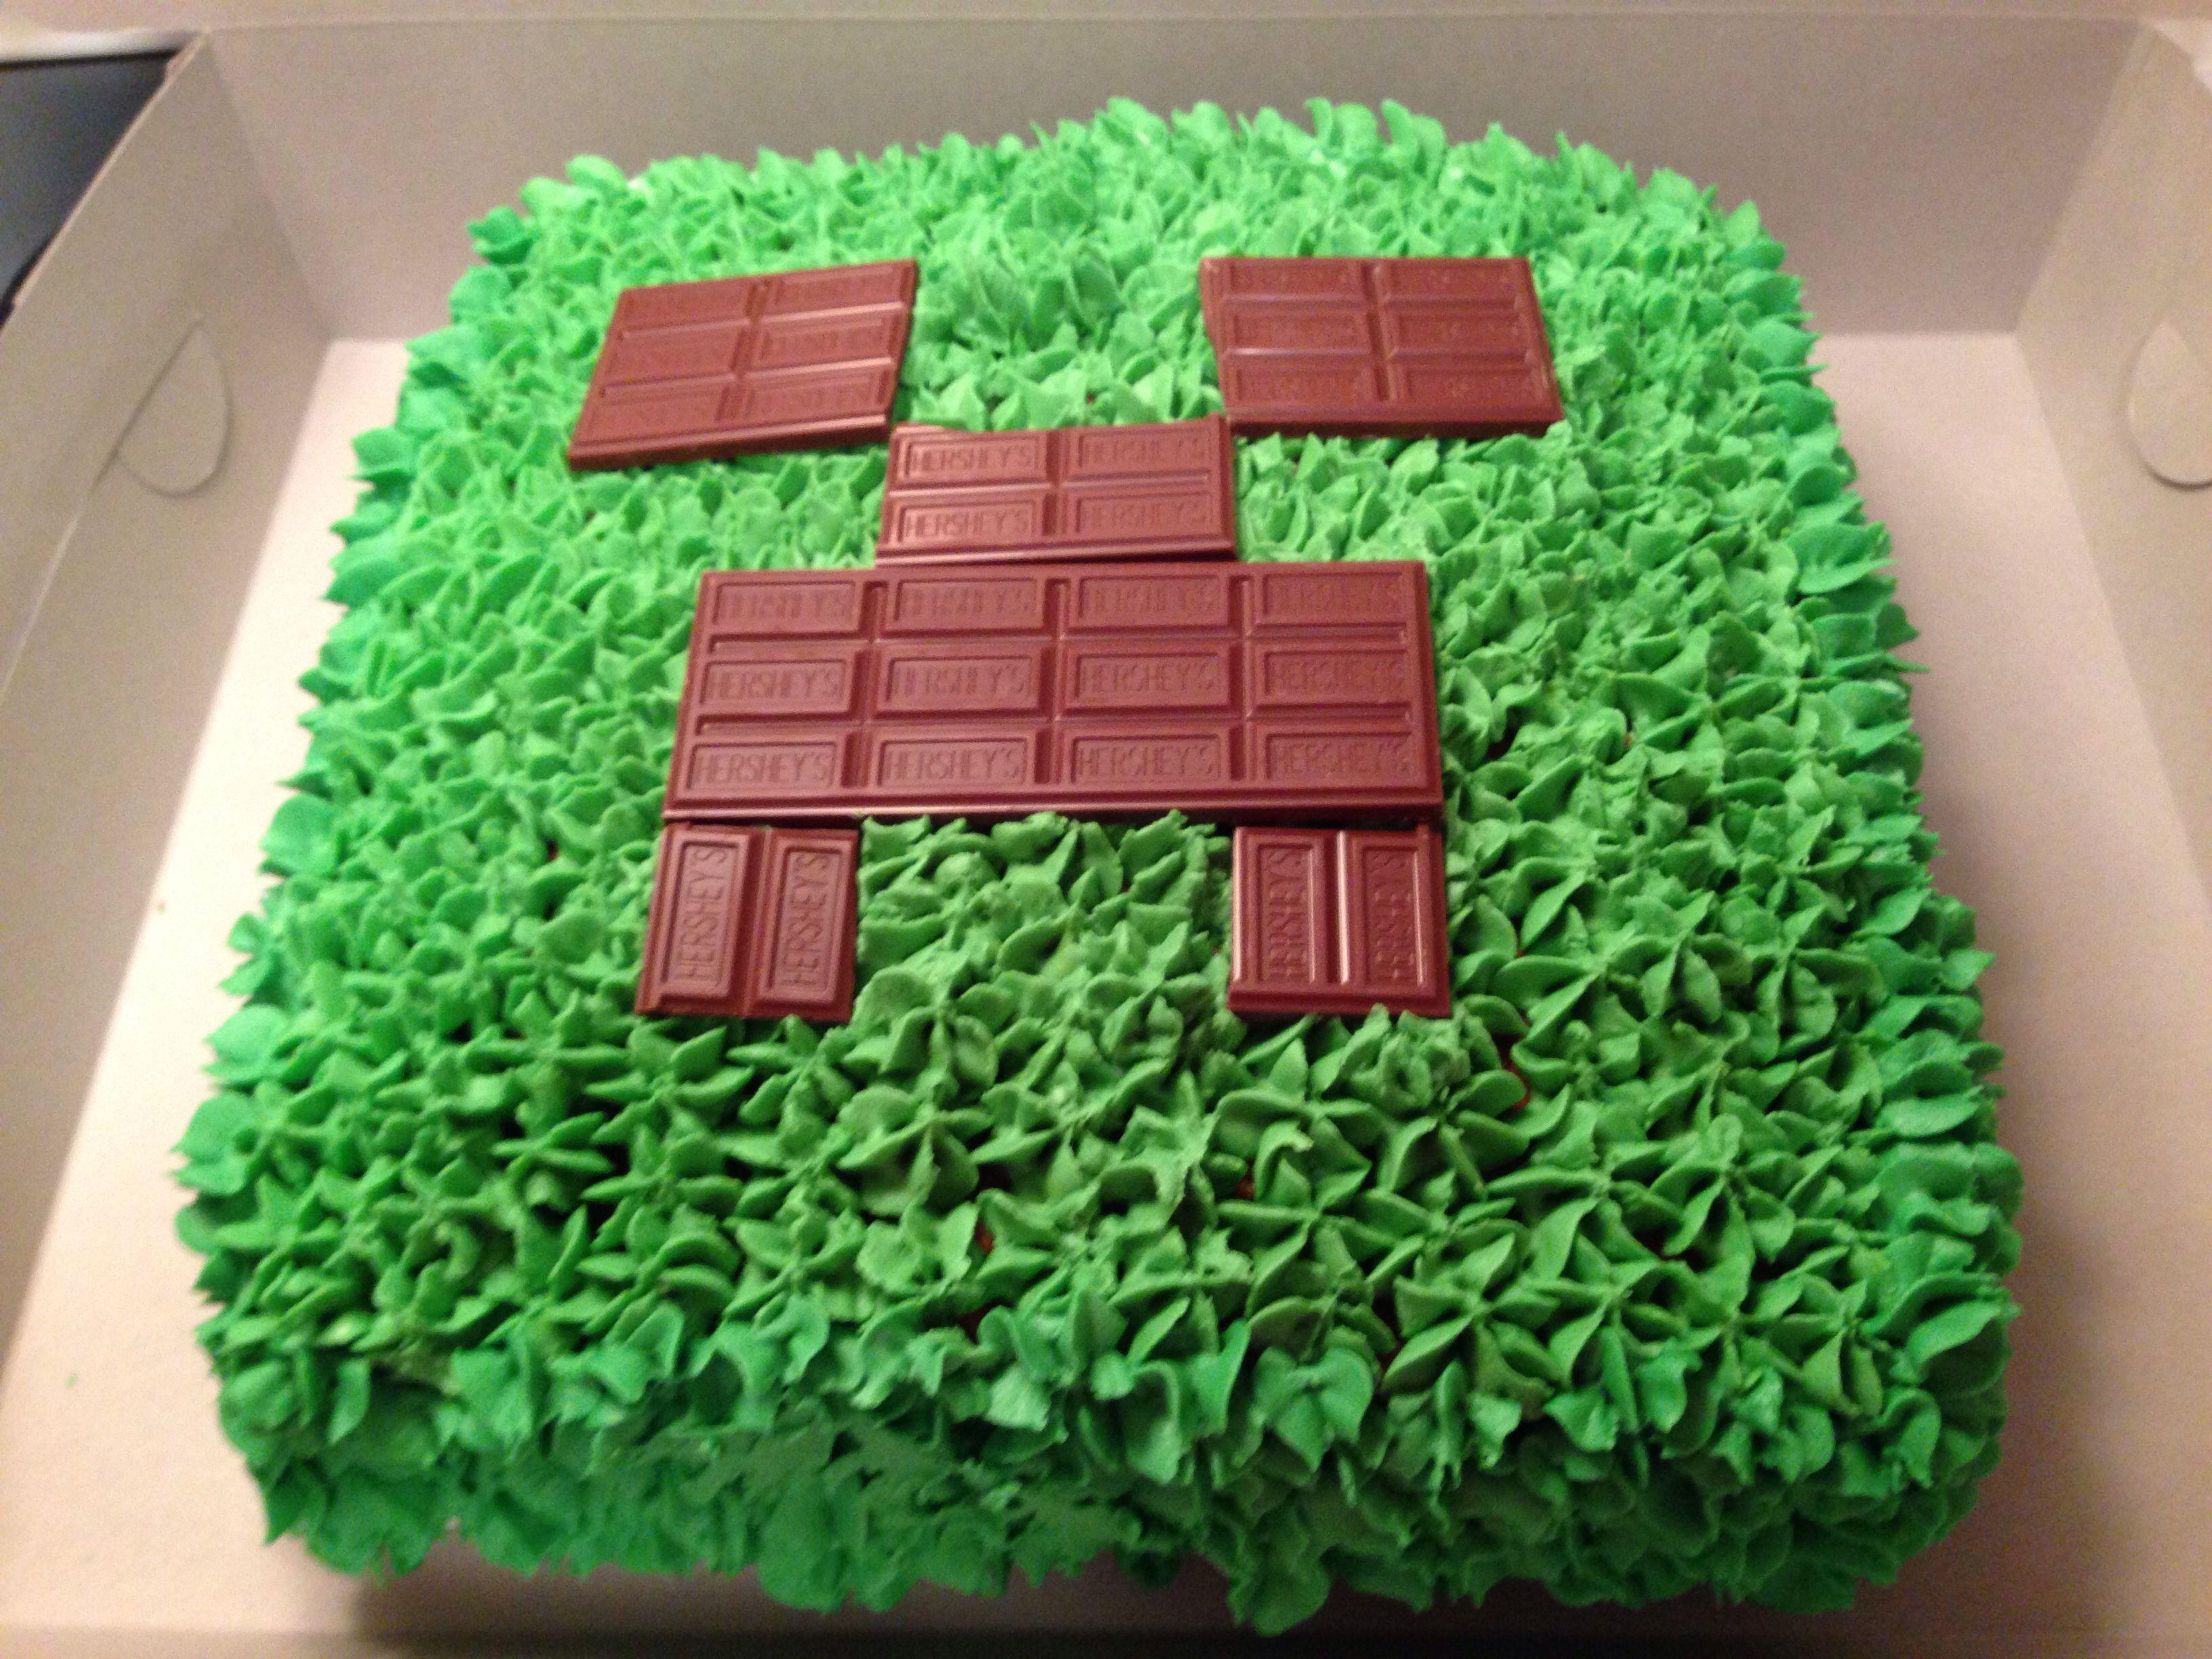 Decorating Ideas > Minecraft CakeIm Pretty Sure This Is Easy Enough T ~ 024119_Cake Decorating Ideas Minecraft